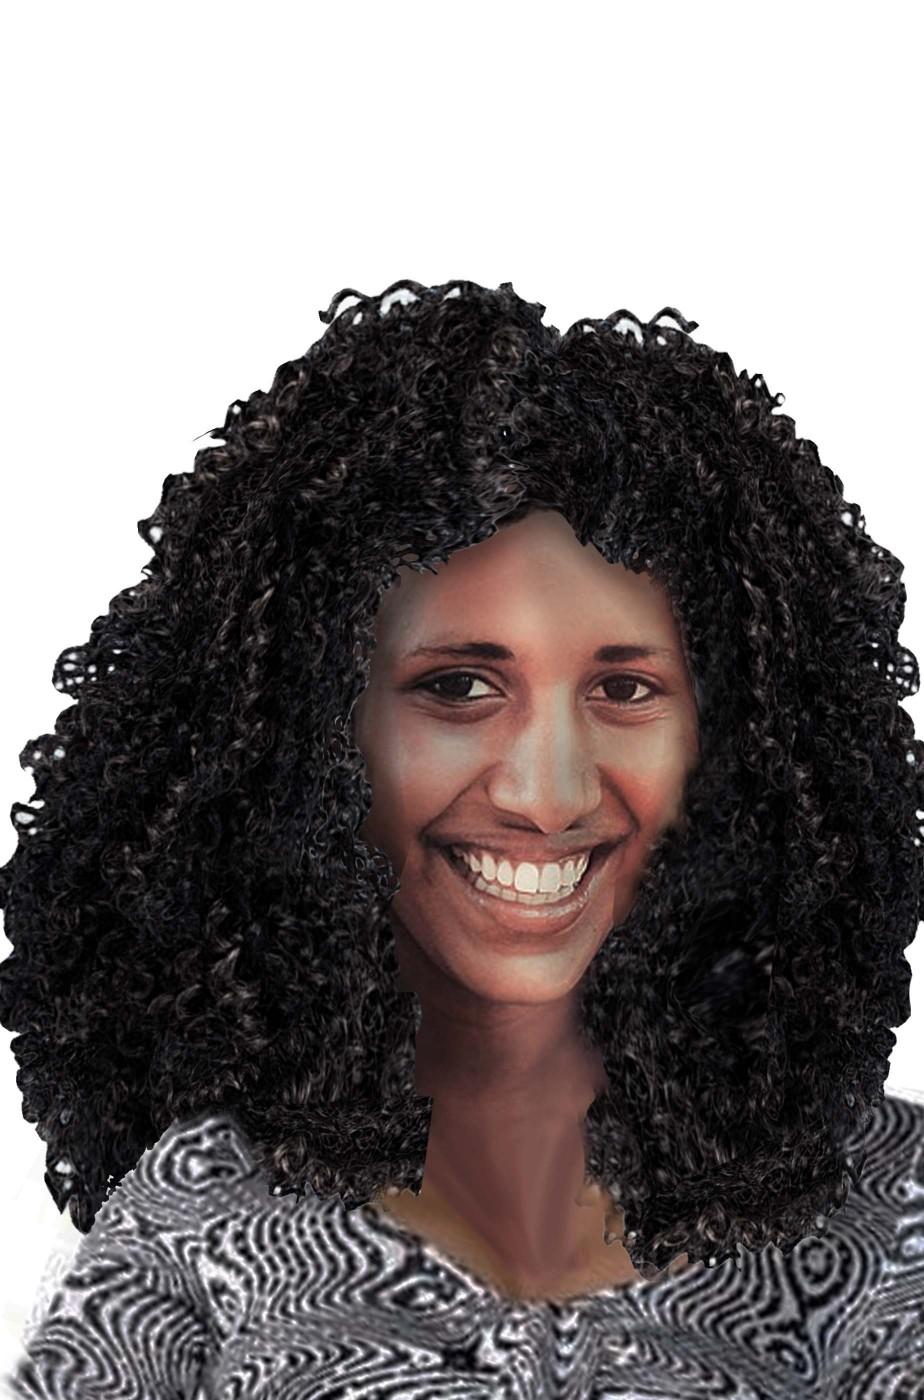 Parrucca nera riccia media folta afro anni 70